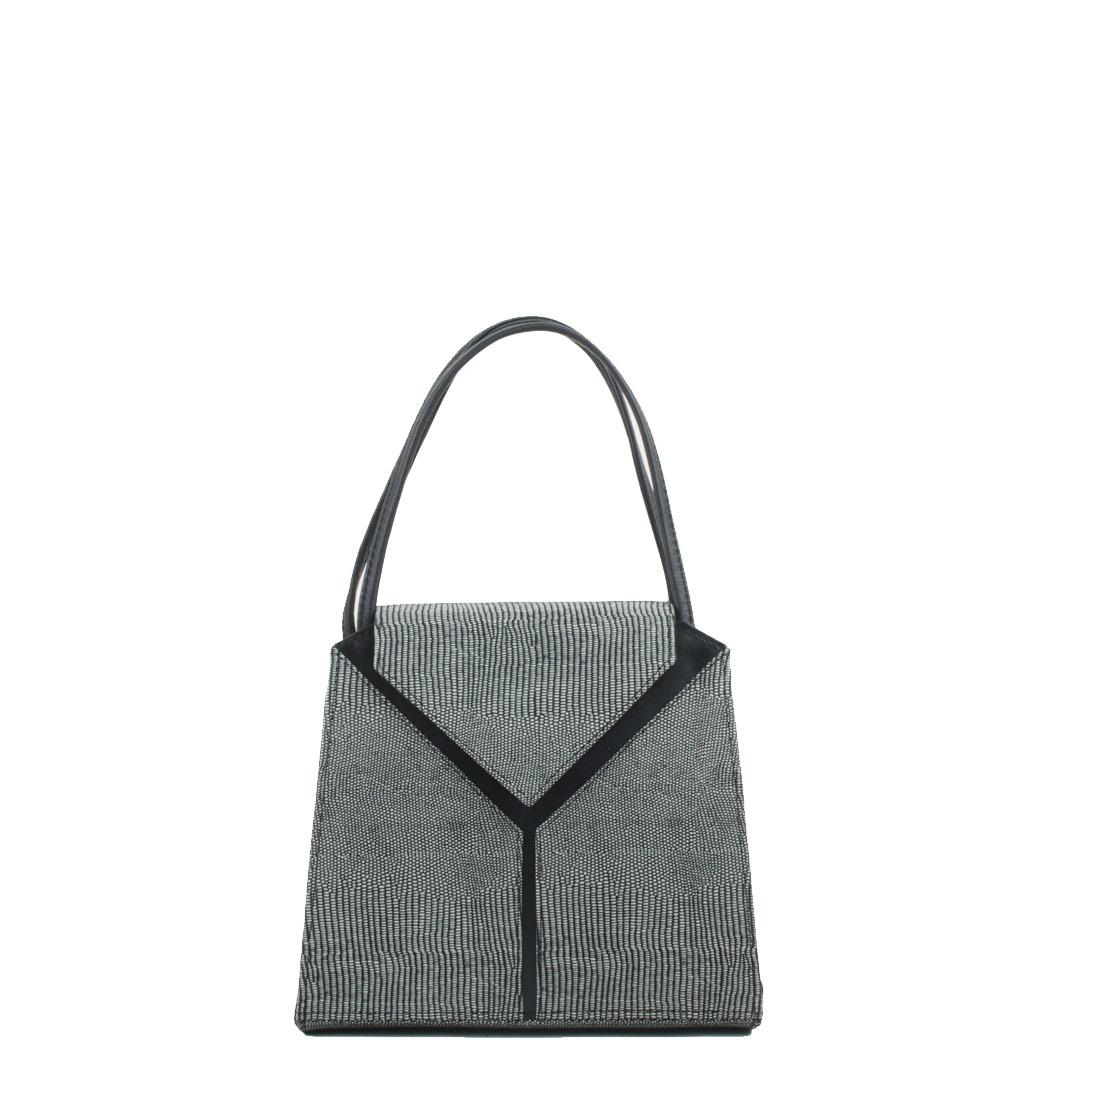 Yasmin Courmayeur Leather Evening Shoulder Bag